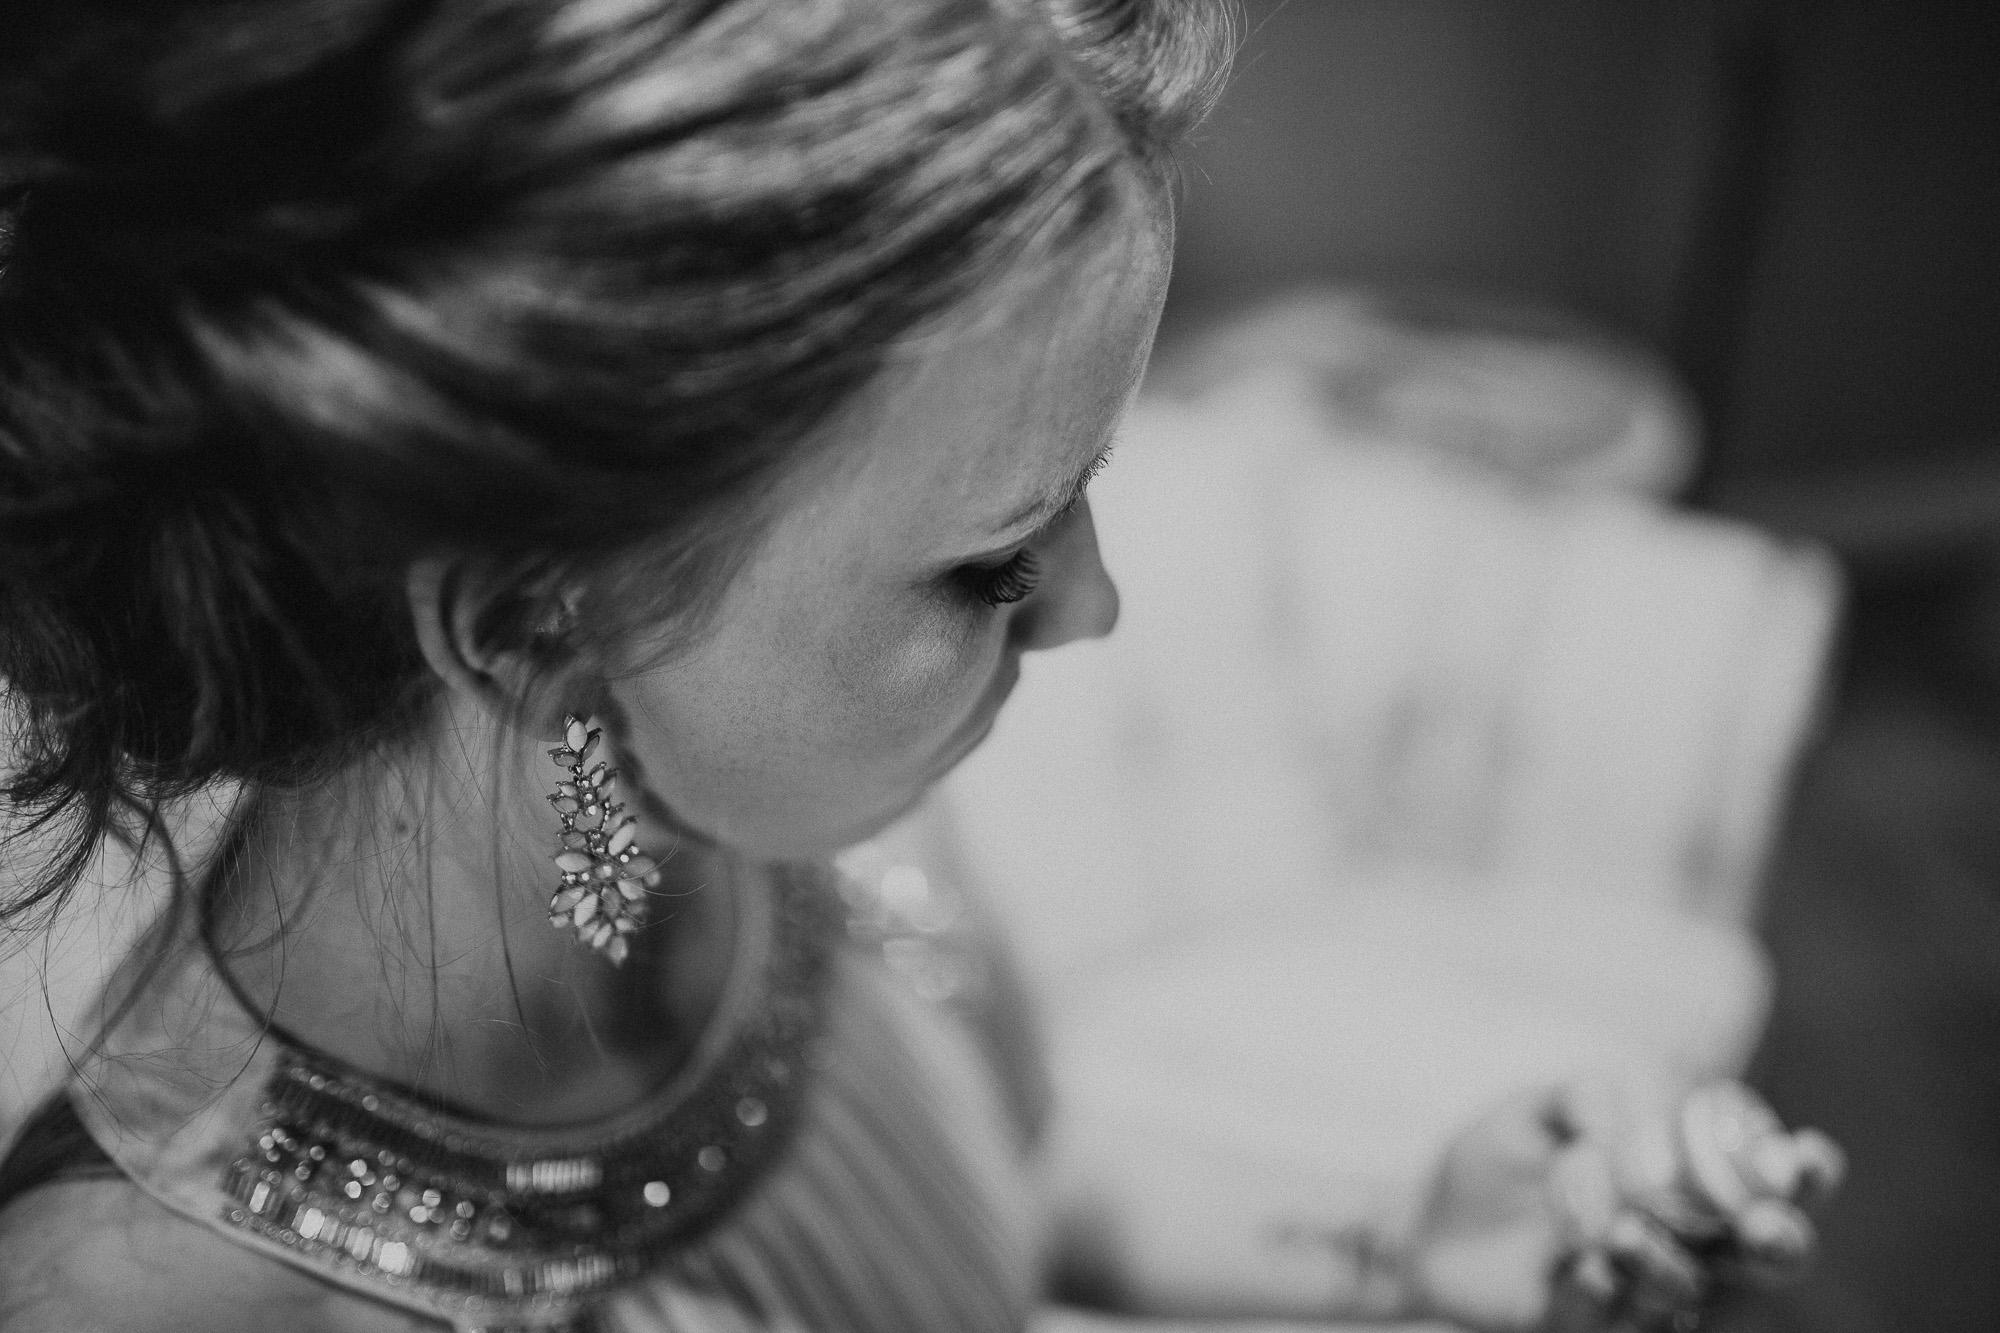 DanielaMarquardtPhotography_Hochzeitsfotograf_Düsseldorf_Köln_Mallorca_Bayern_Austria_Harz_Wedding_AileenundLennart_Weddingphotographer_Ibiza_Tuskany_Italien_Toskana_Portugal_Lissabon36